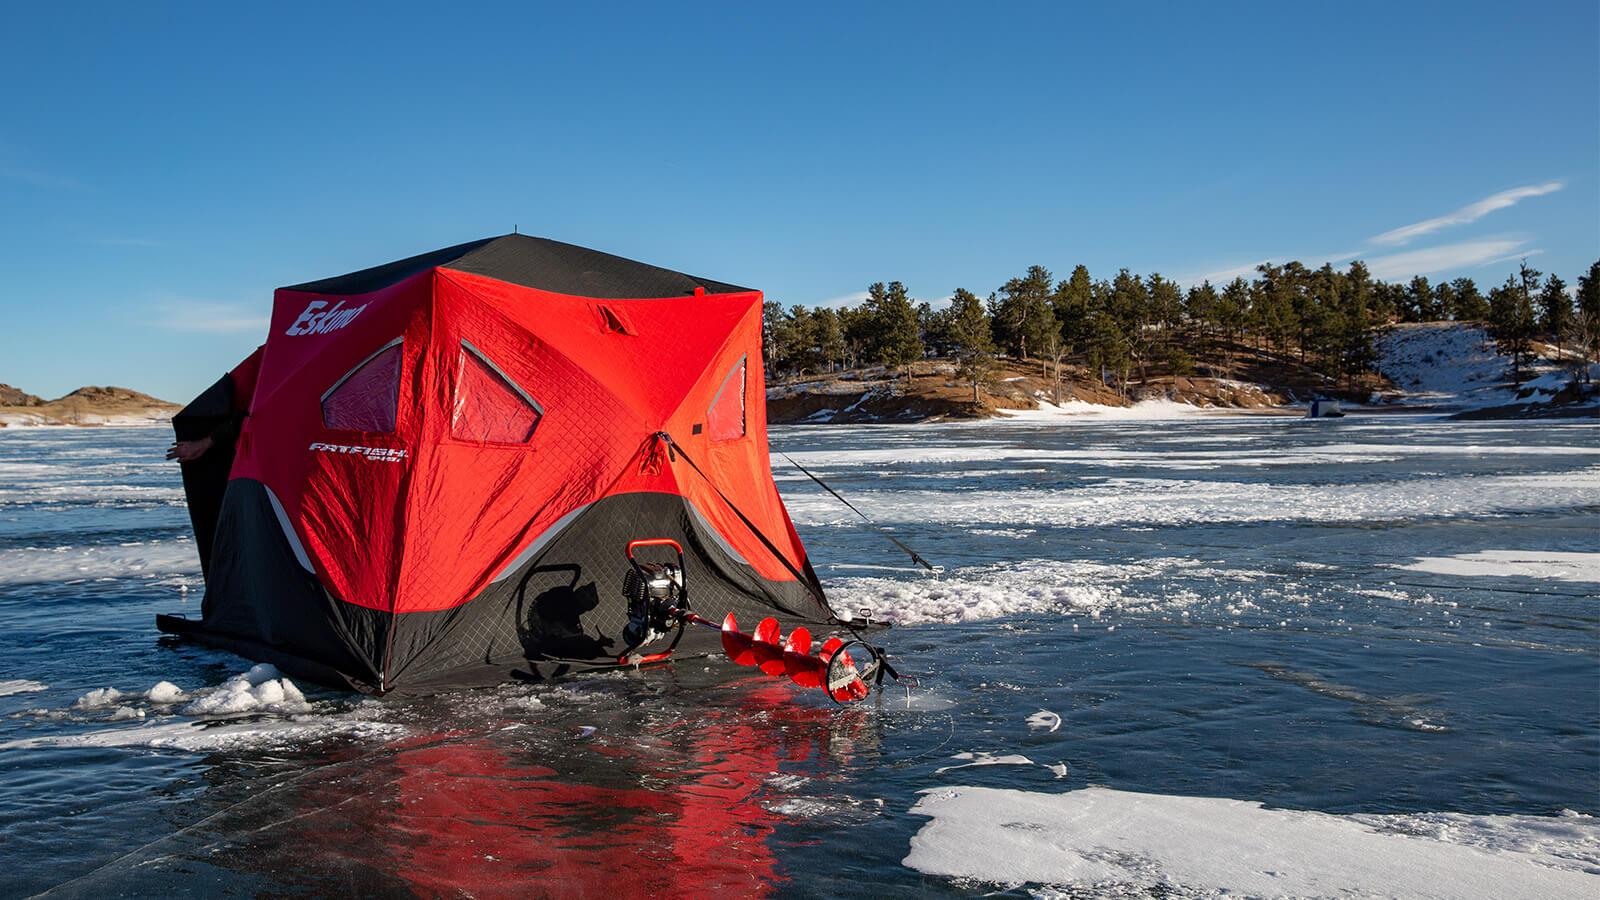 Ice fishing tent on lake